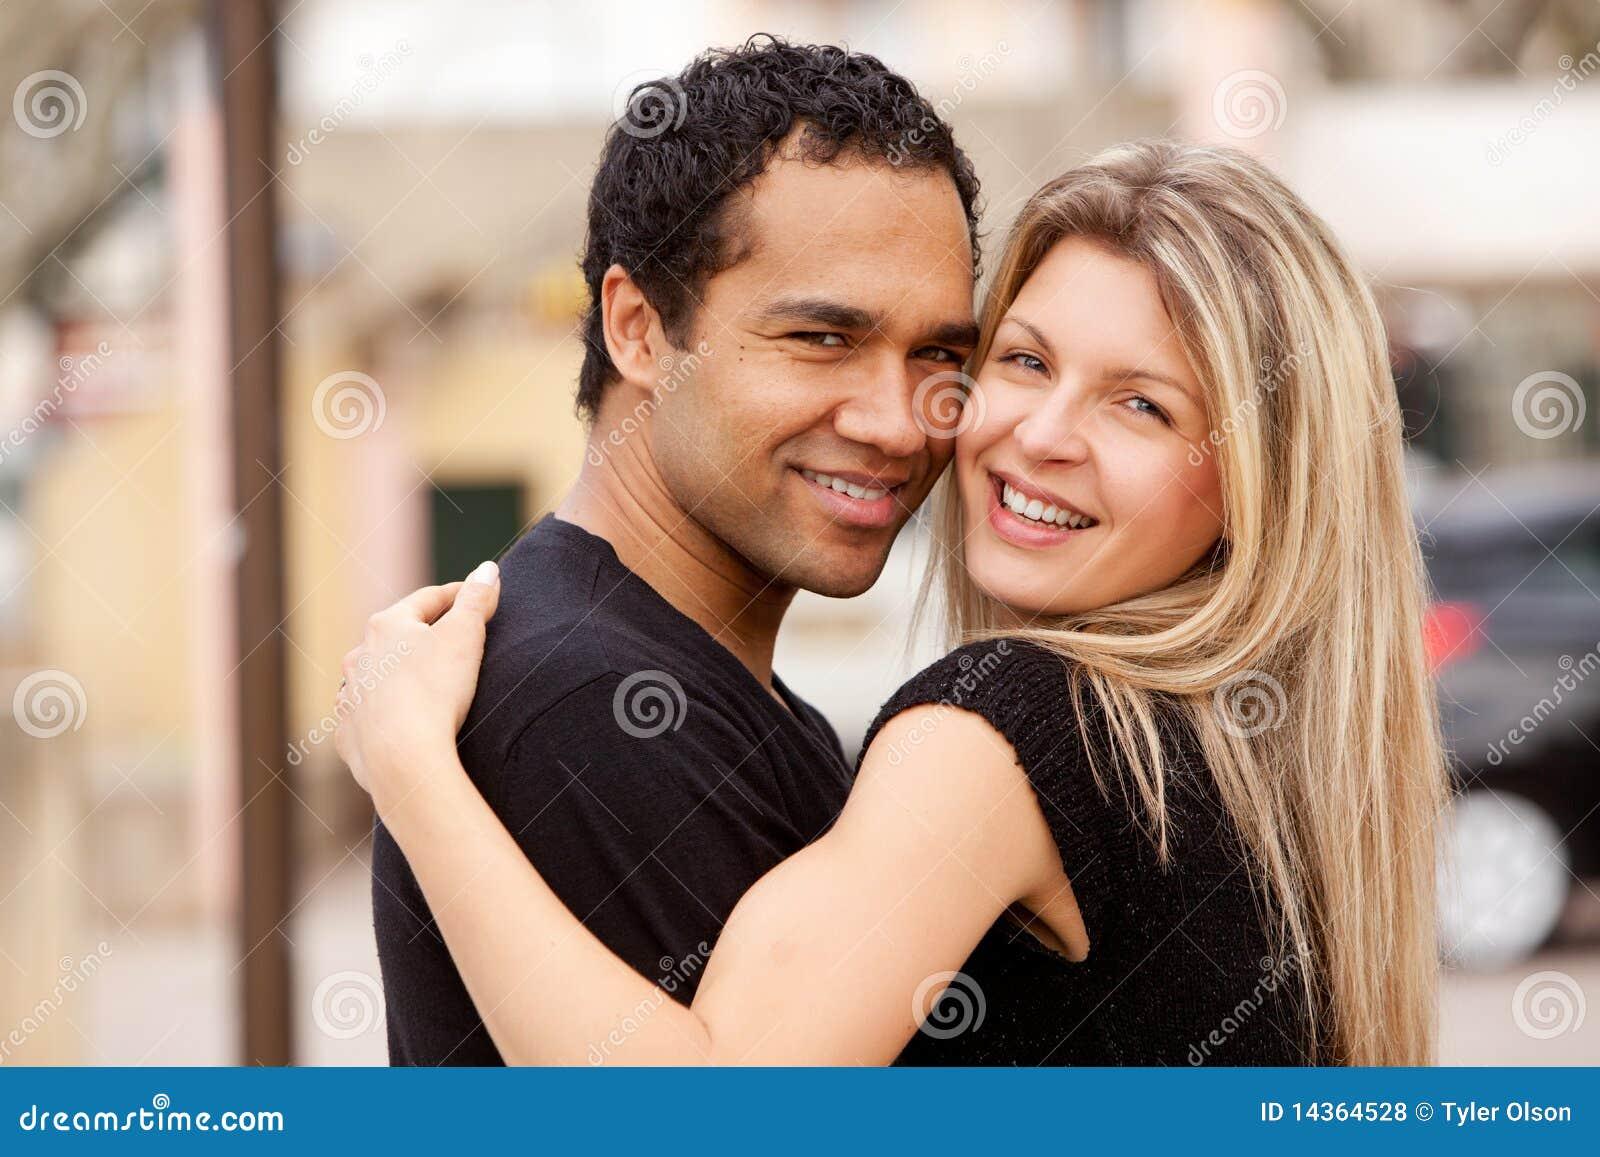 https://thumbs.dreamstime.com/z/hug-happy-couple-14364528.jpg